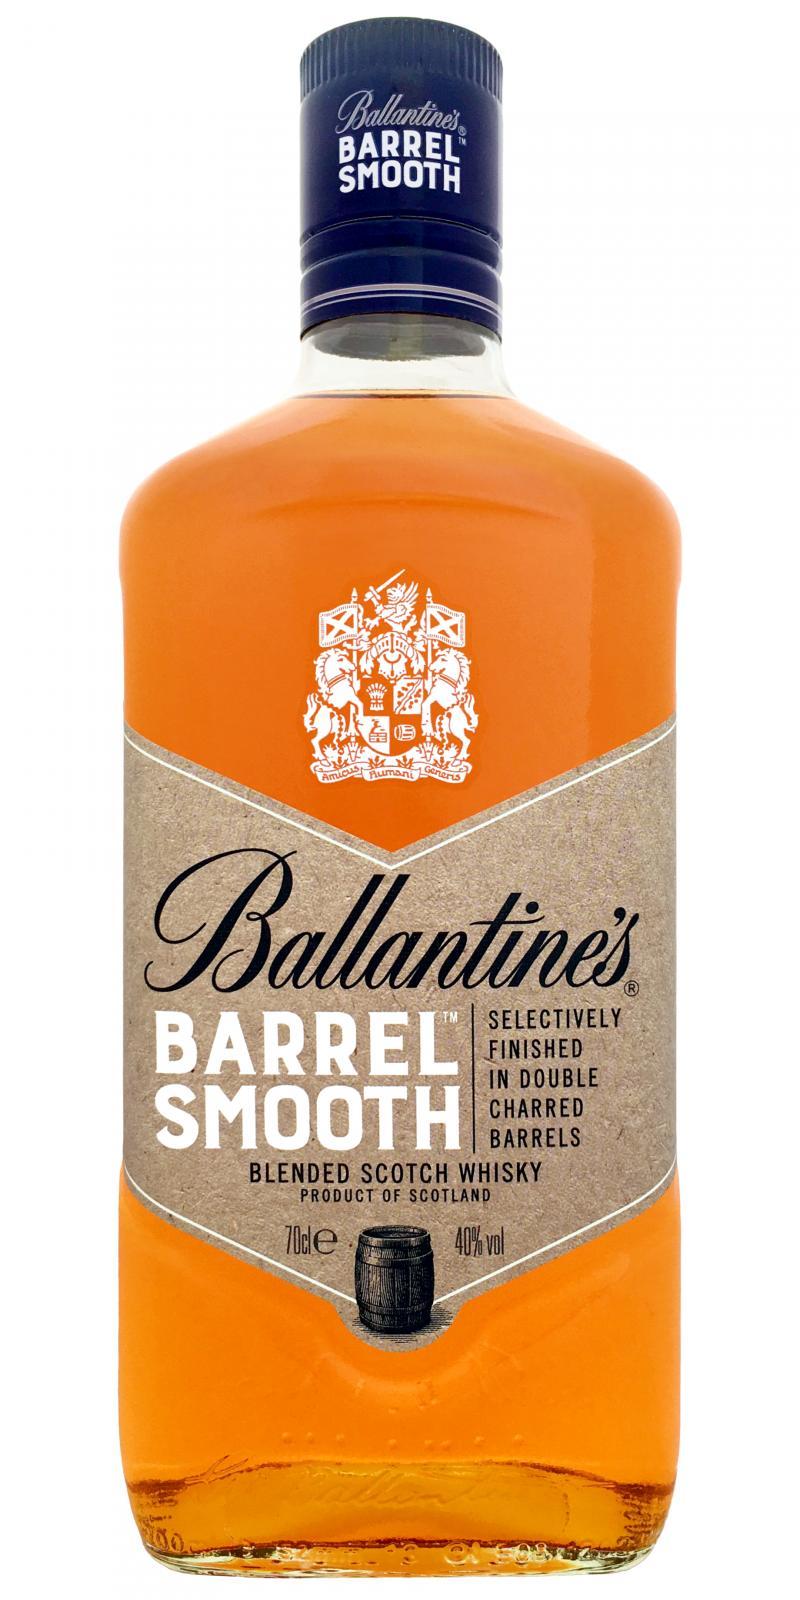 Ballantine's Barrel Smooth